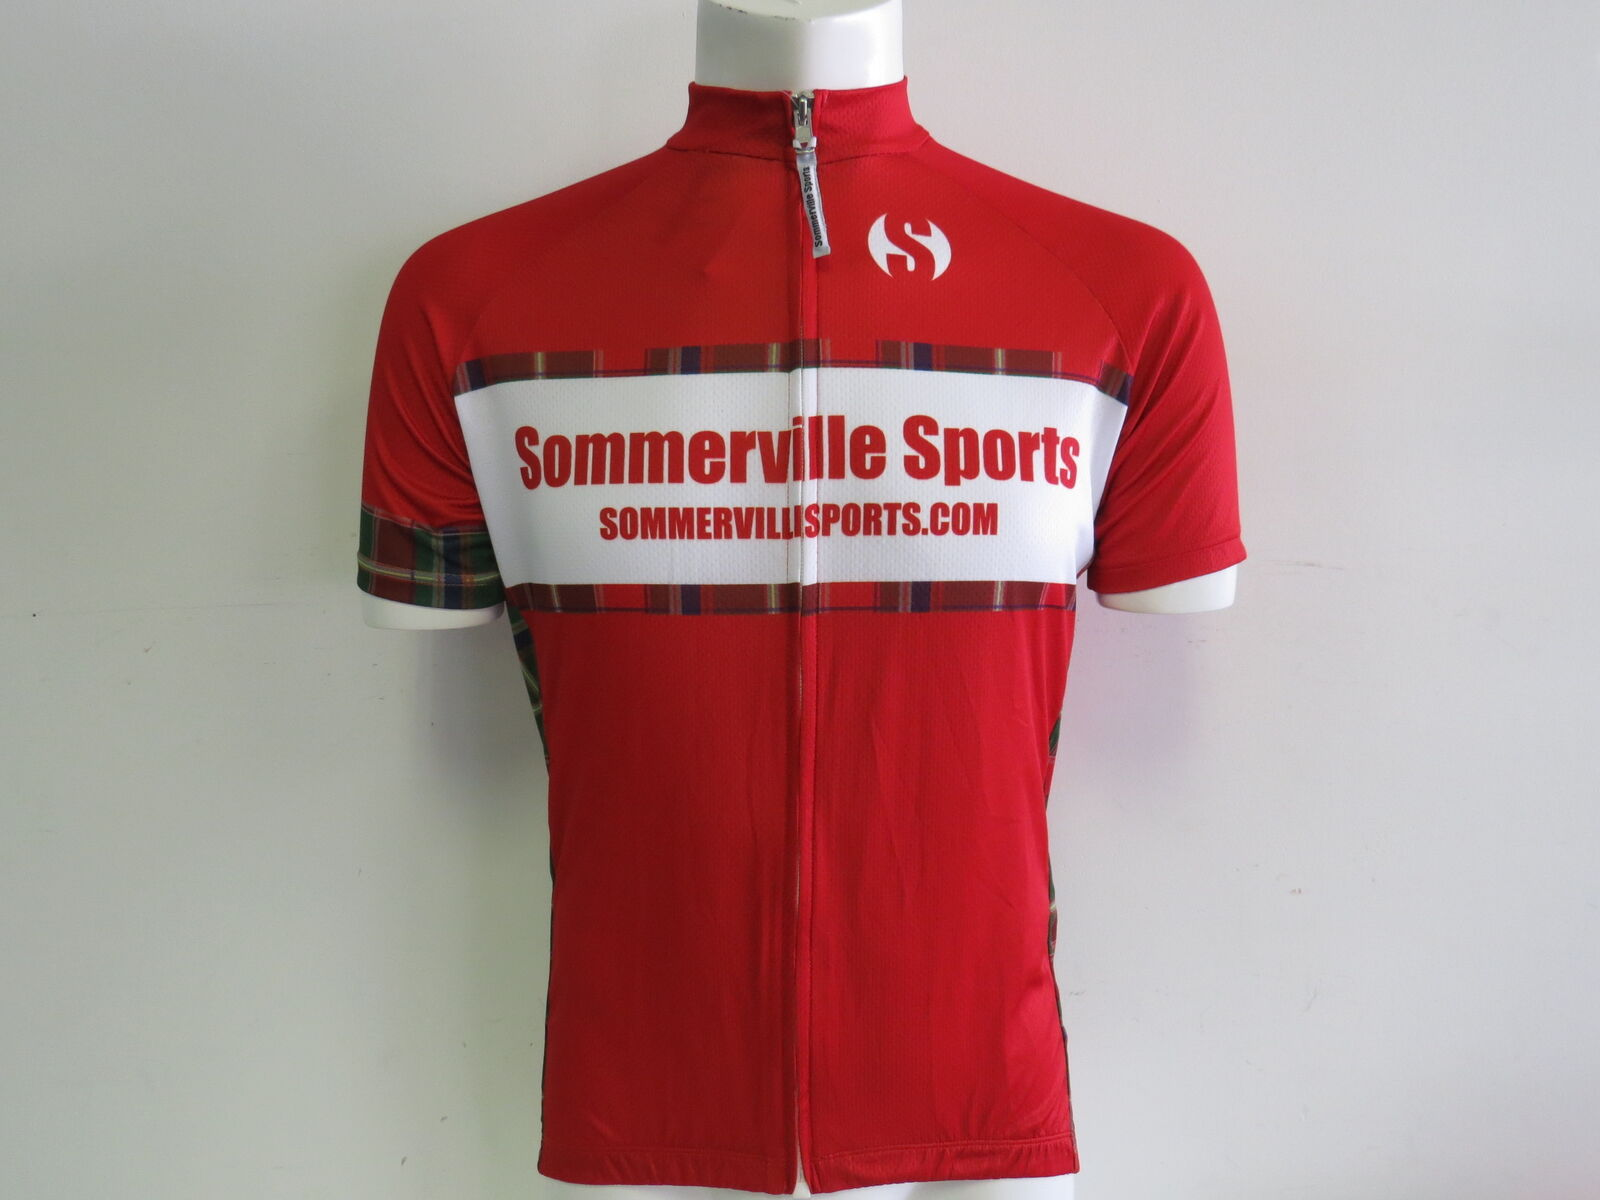 Brand New Sommerville Sports Short Sleeve Cycling Jersey Race Cut Red XXL 2XL